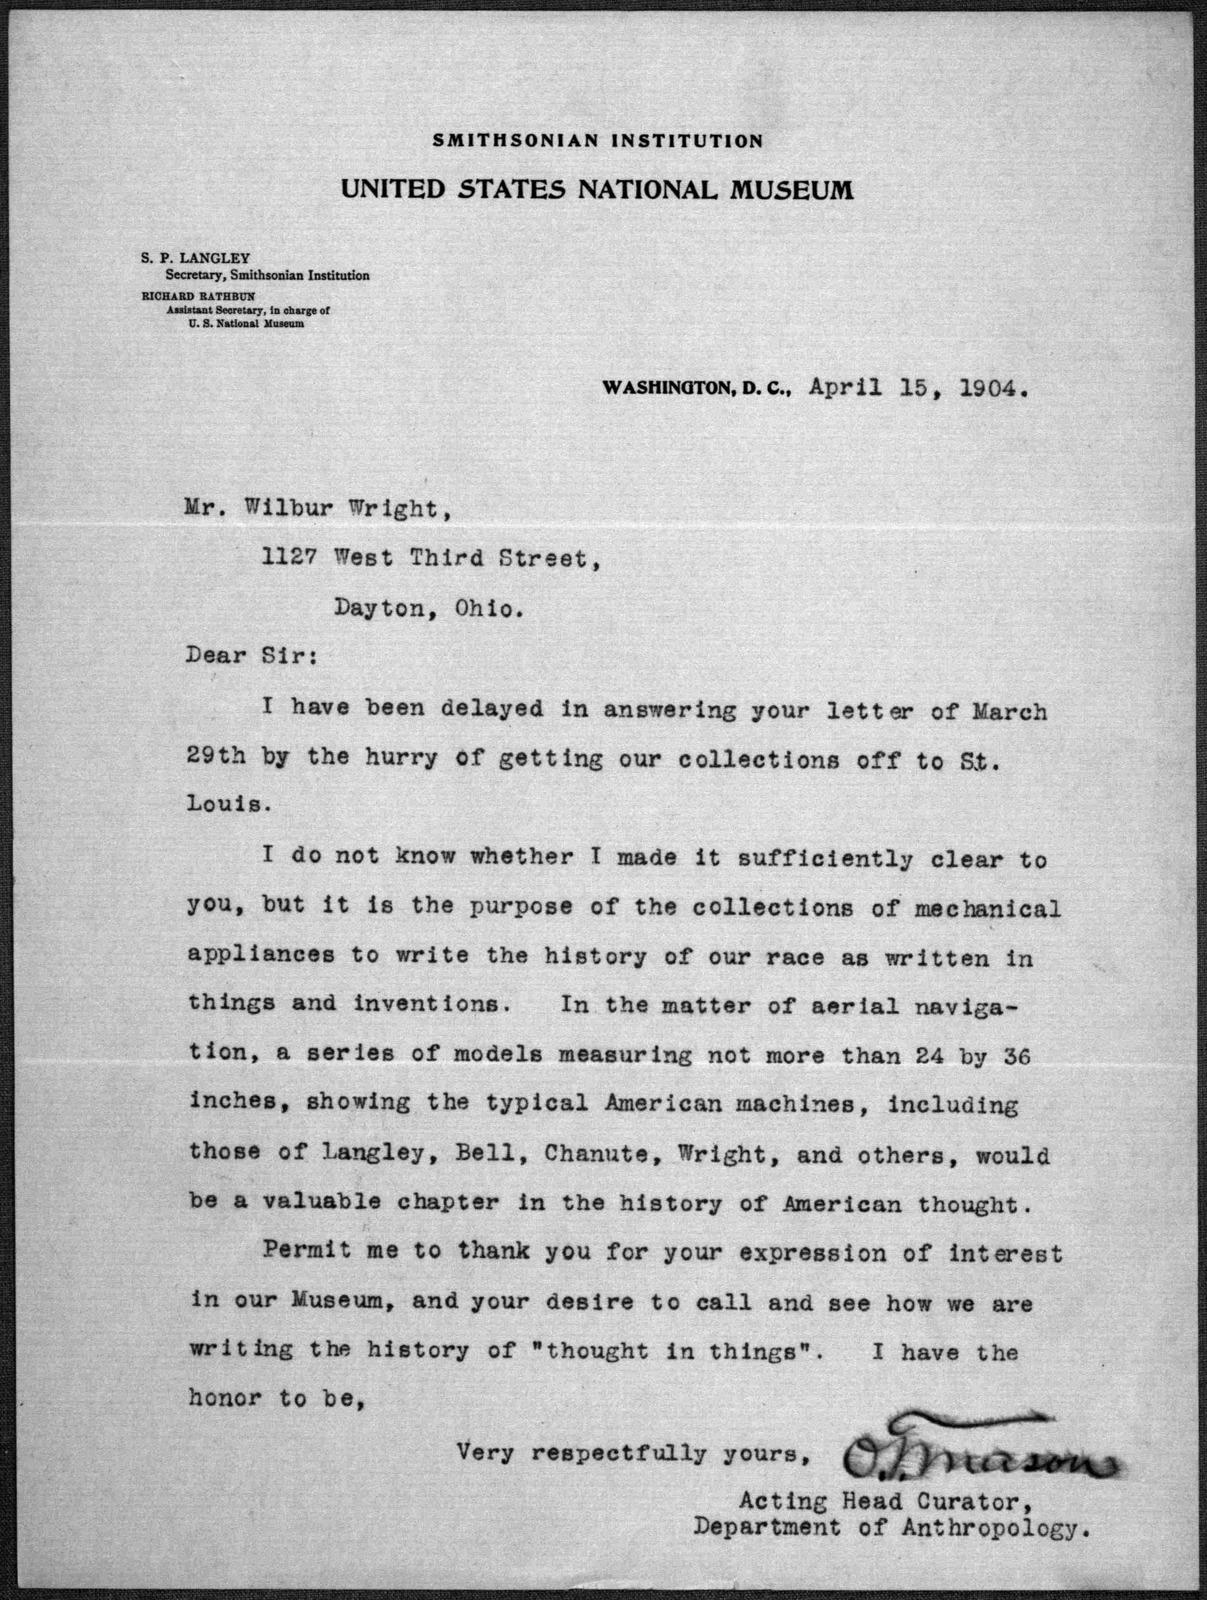 General Correspondence:  Smithsonian Institution, 1899-1909